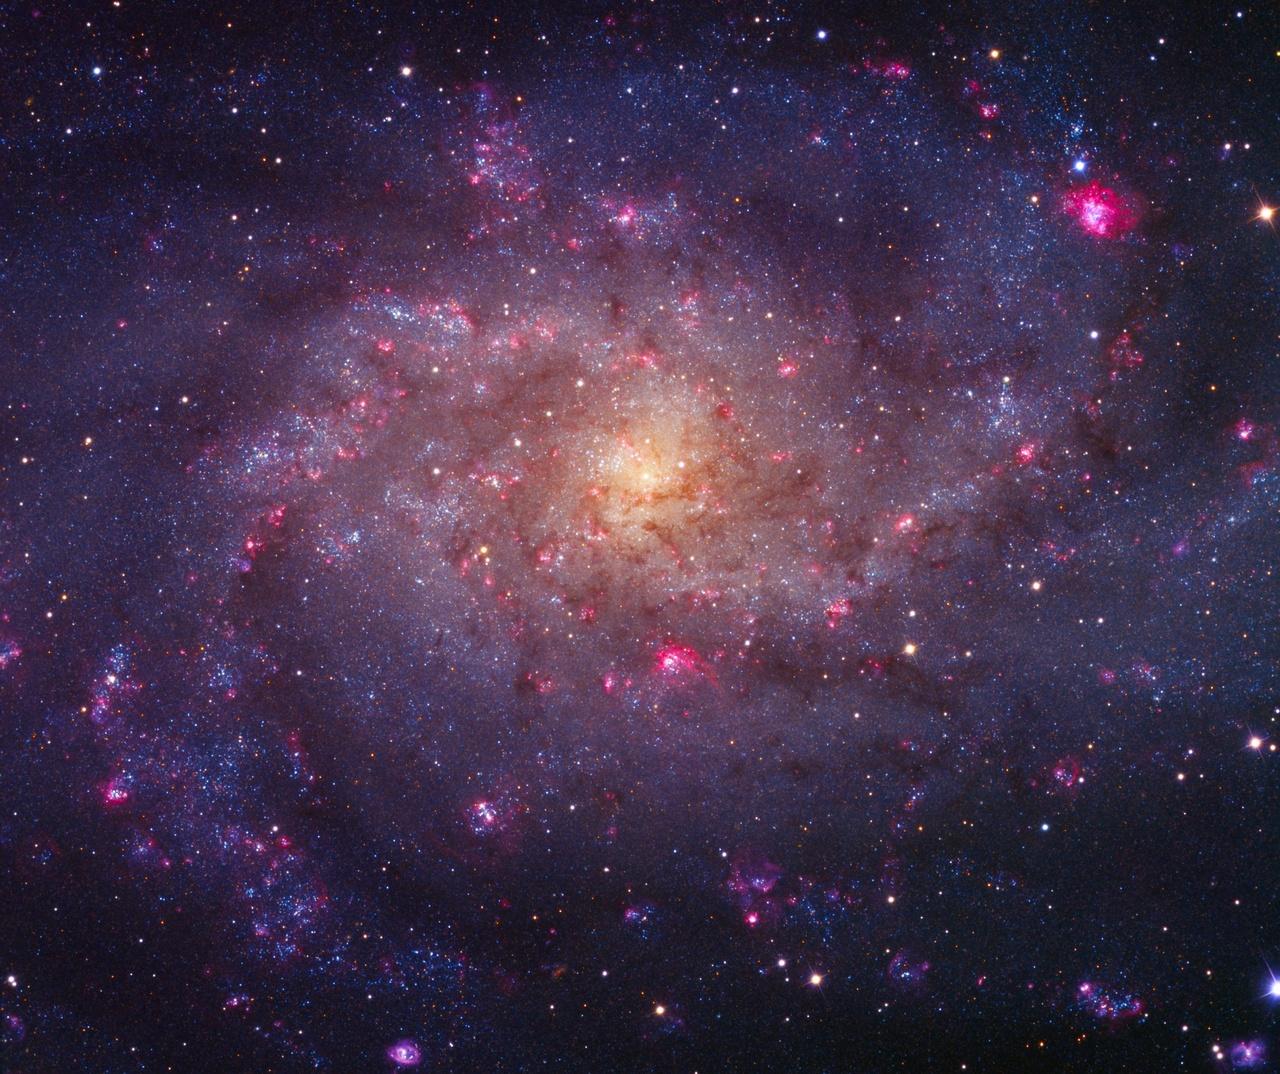 Galaxy Wallpaper 1080p: Galaxies Wallpaper HD